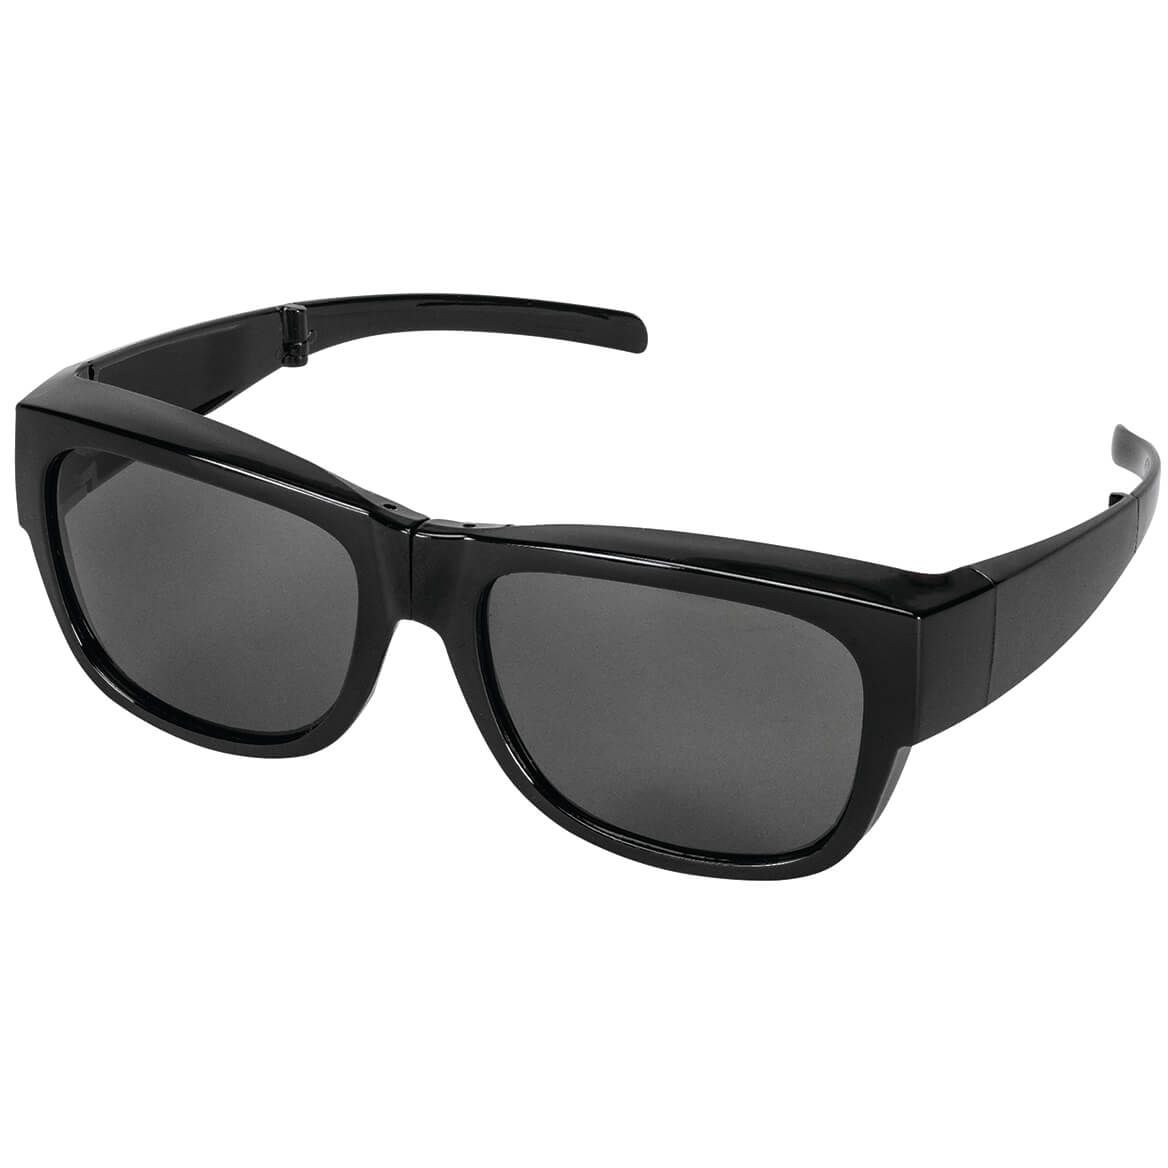 Black Folding Fit Over Polarized Sunglasses-369657